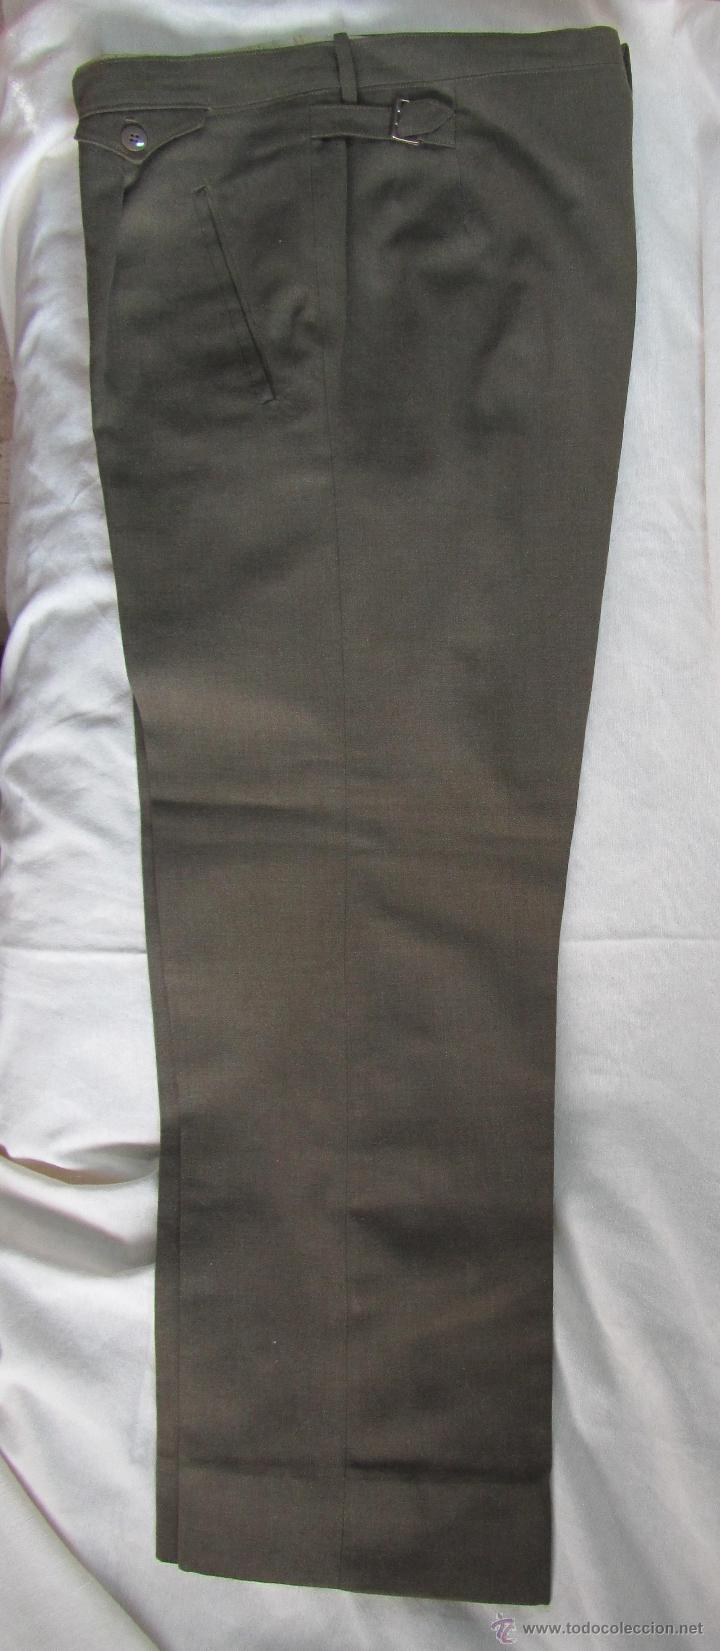 Militaria: Antiguo traje militar: chaqueta + pantalón - Foto 12 - 47048185